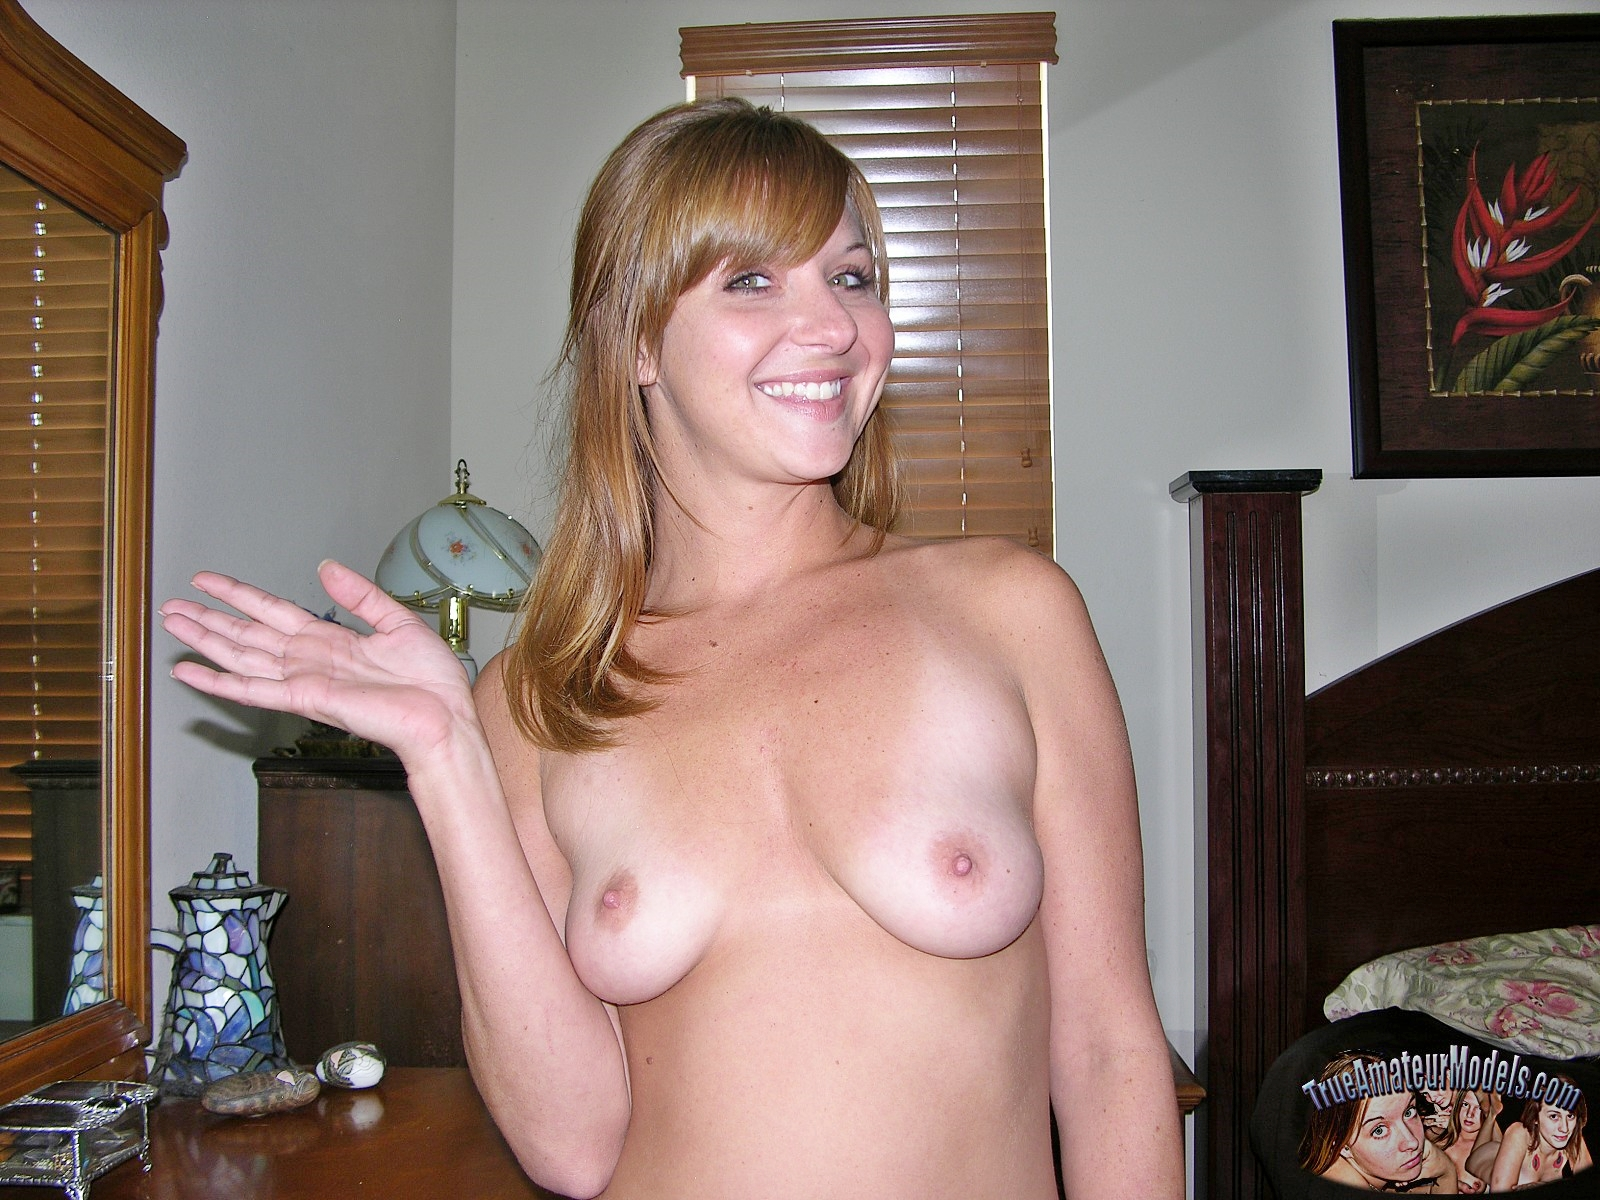 Amateur anal play on tumblr